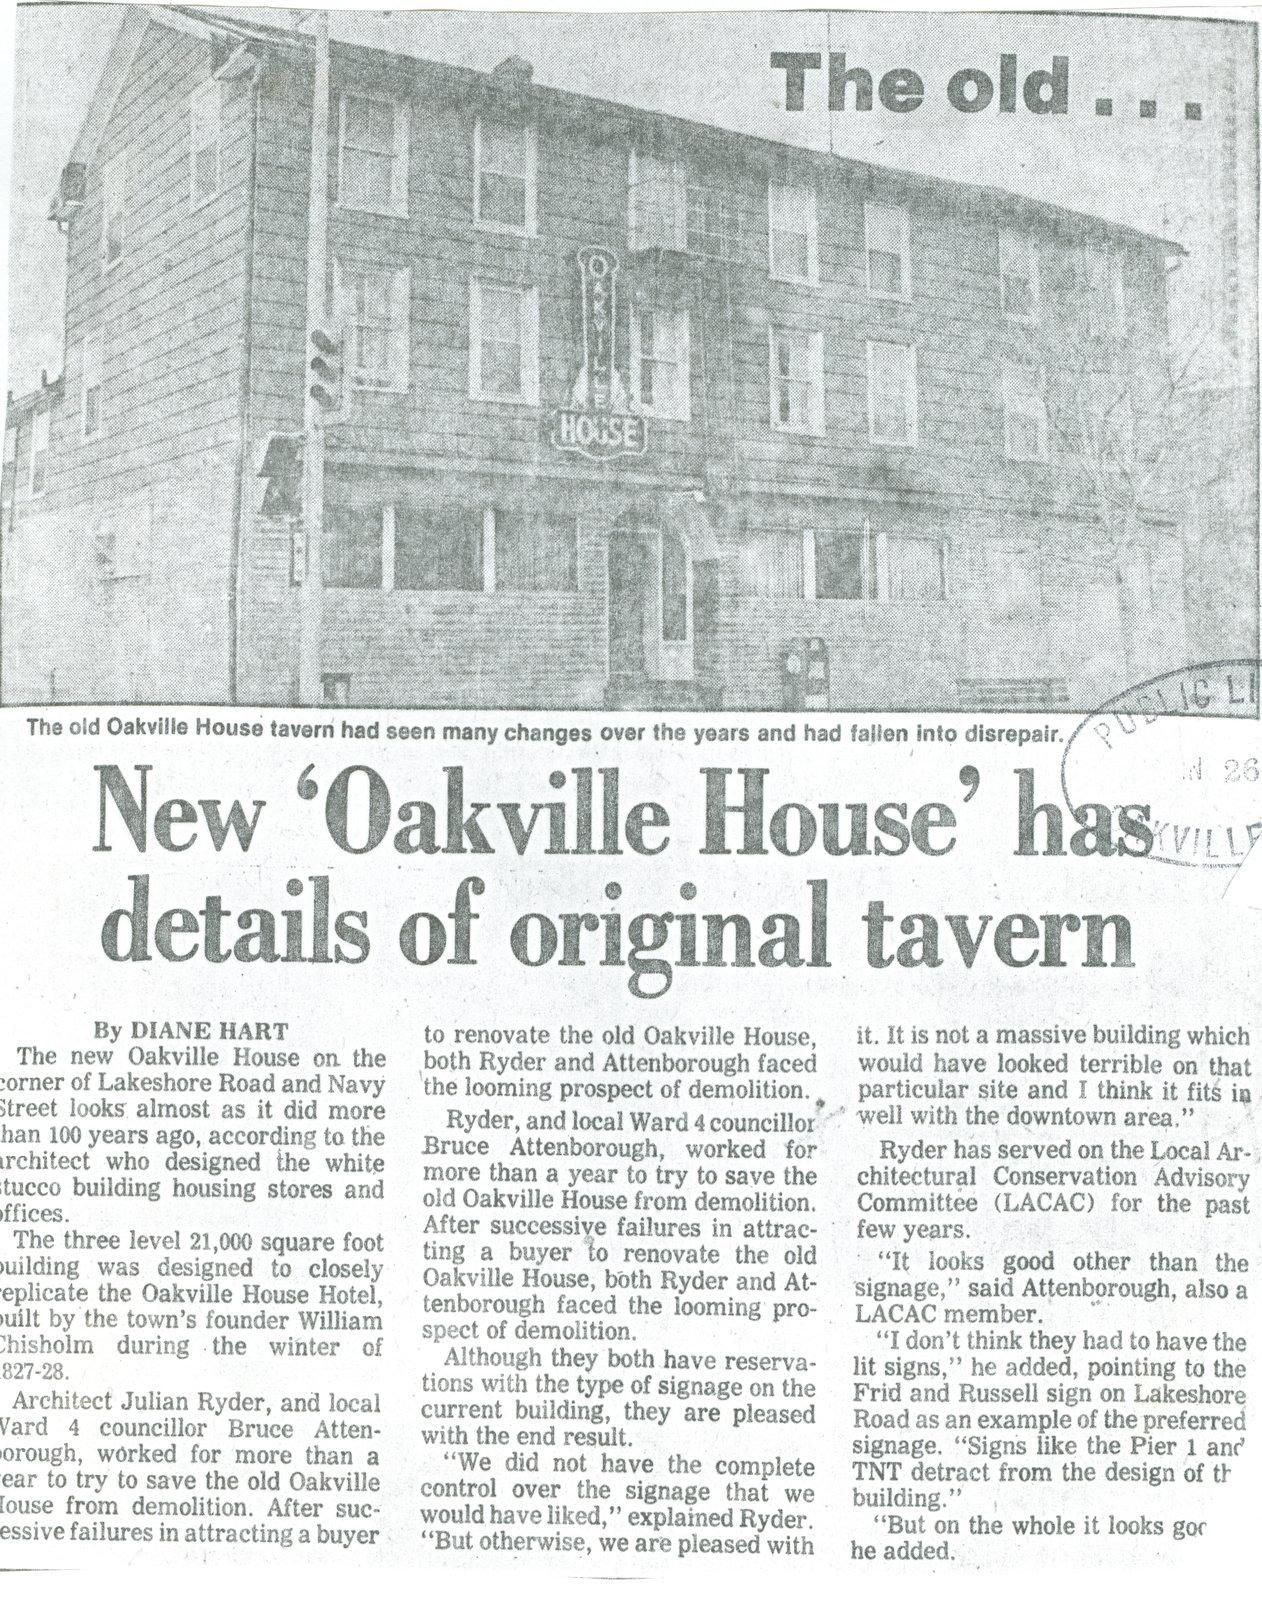 New 'Oakville House' has details of original tavern